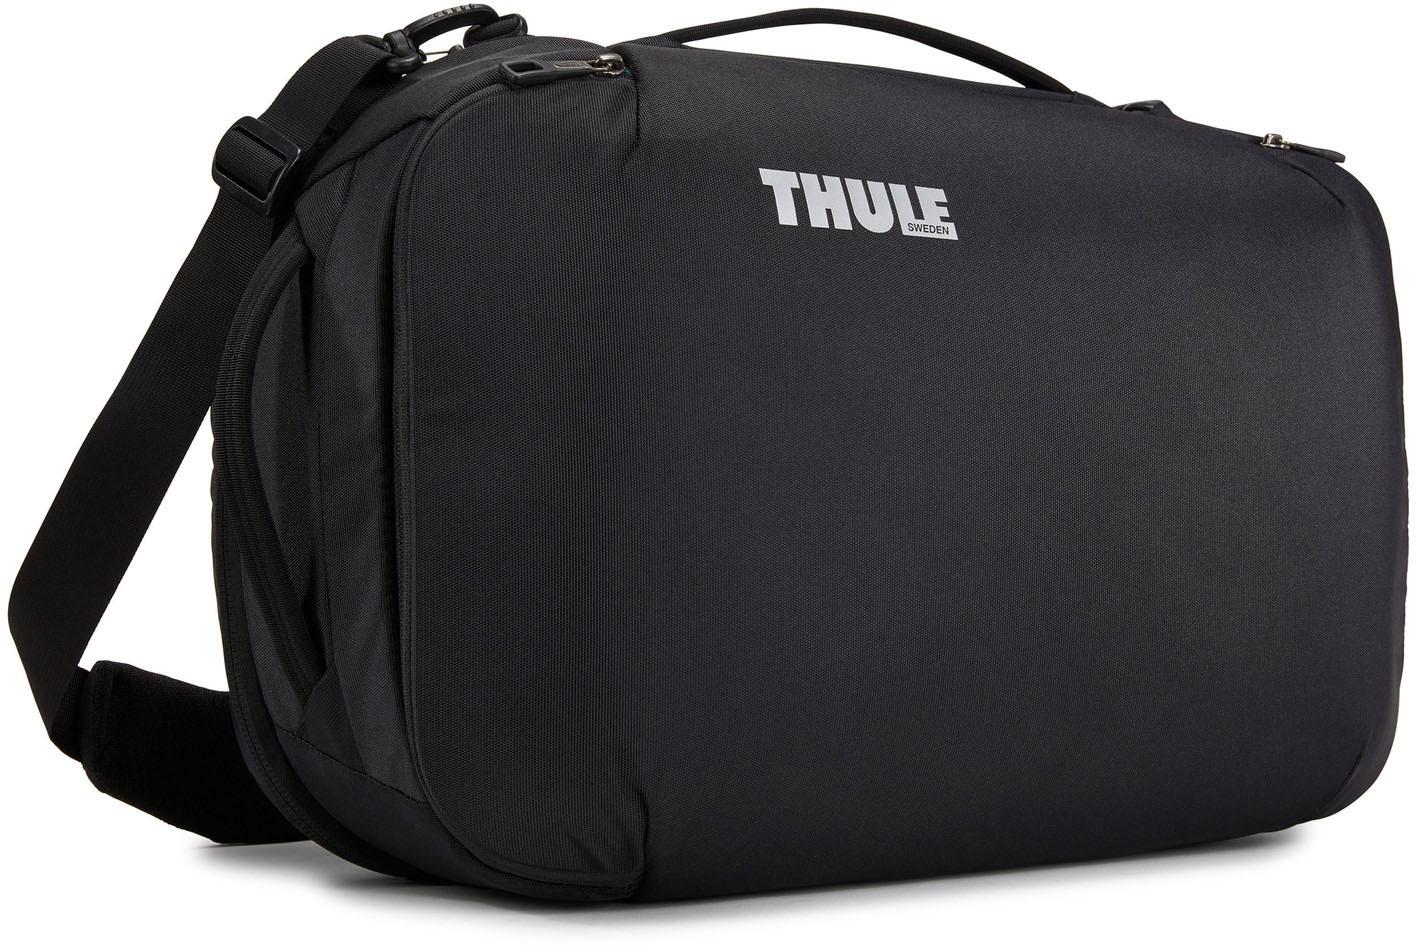 Рюкзаки для путешествий Thule Рюкзак-сумка Thule Subterra Carry-On 40L 3204023_thule.jpg